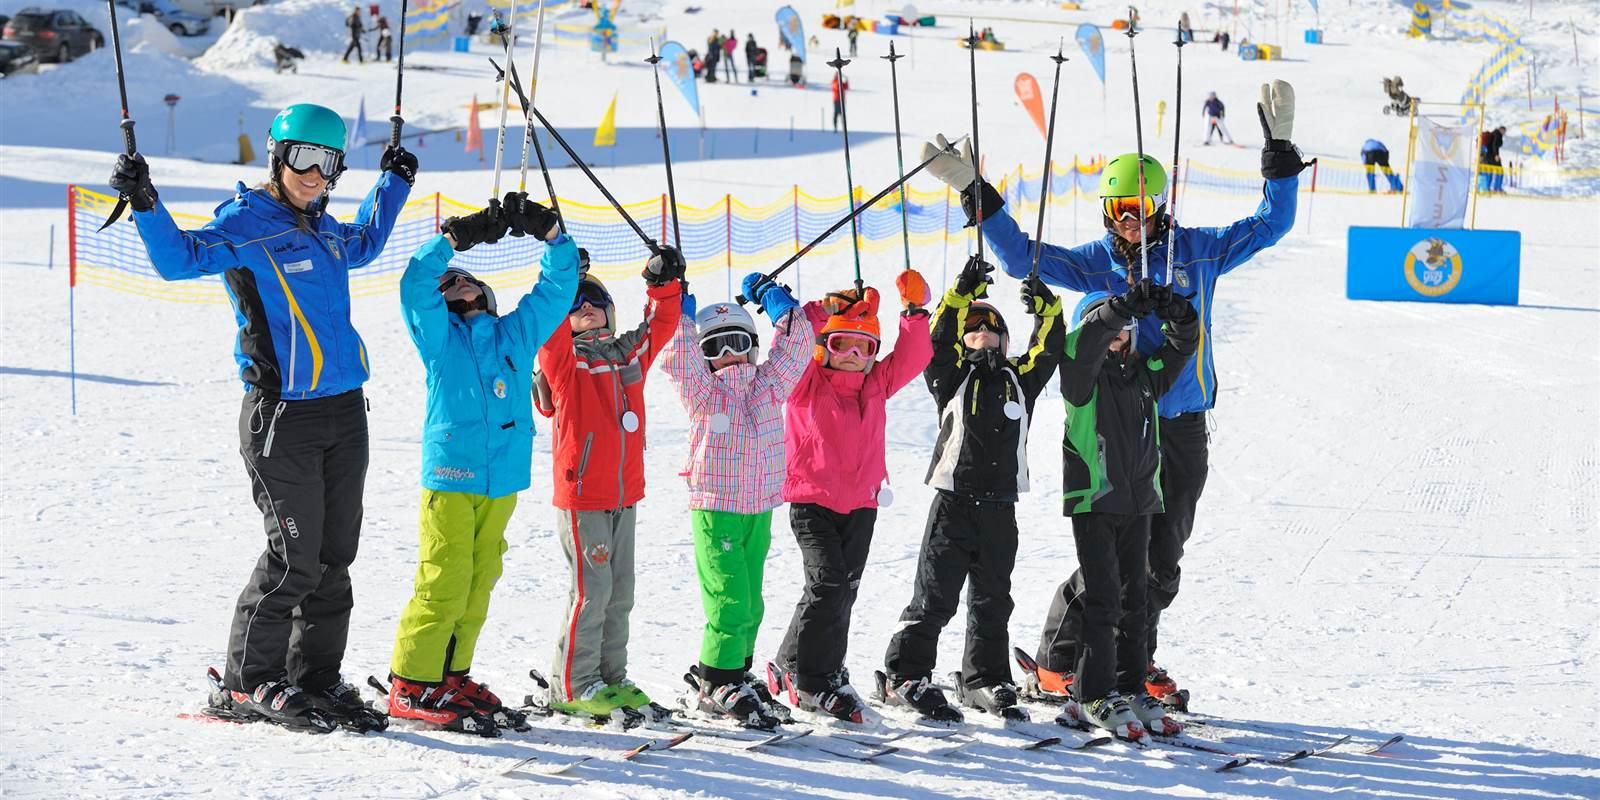 Skischule lech zuers tourismus 1